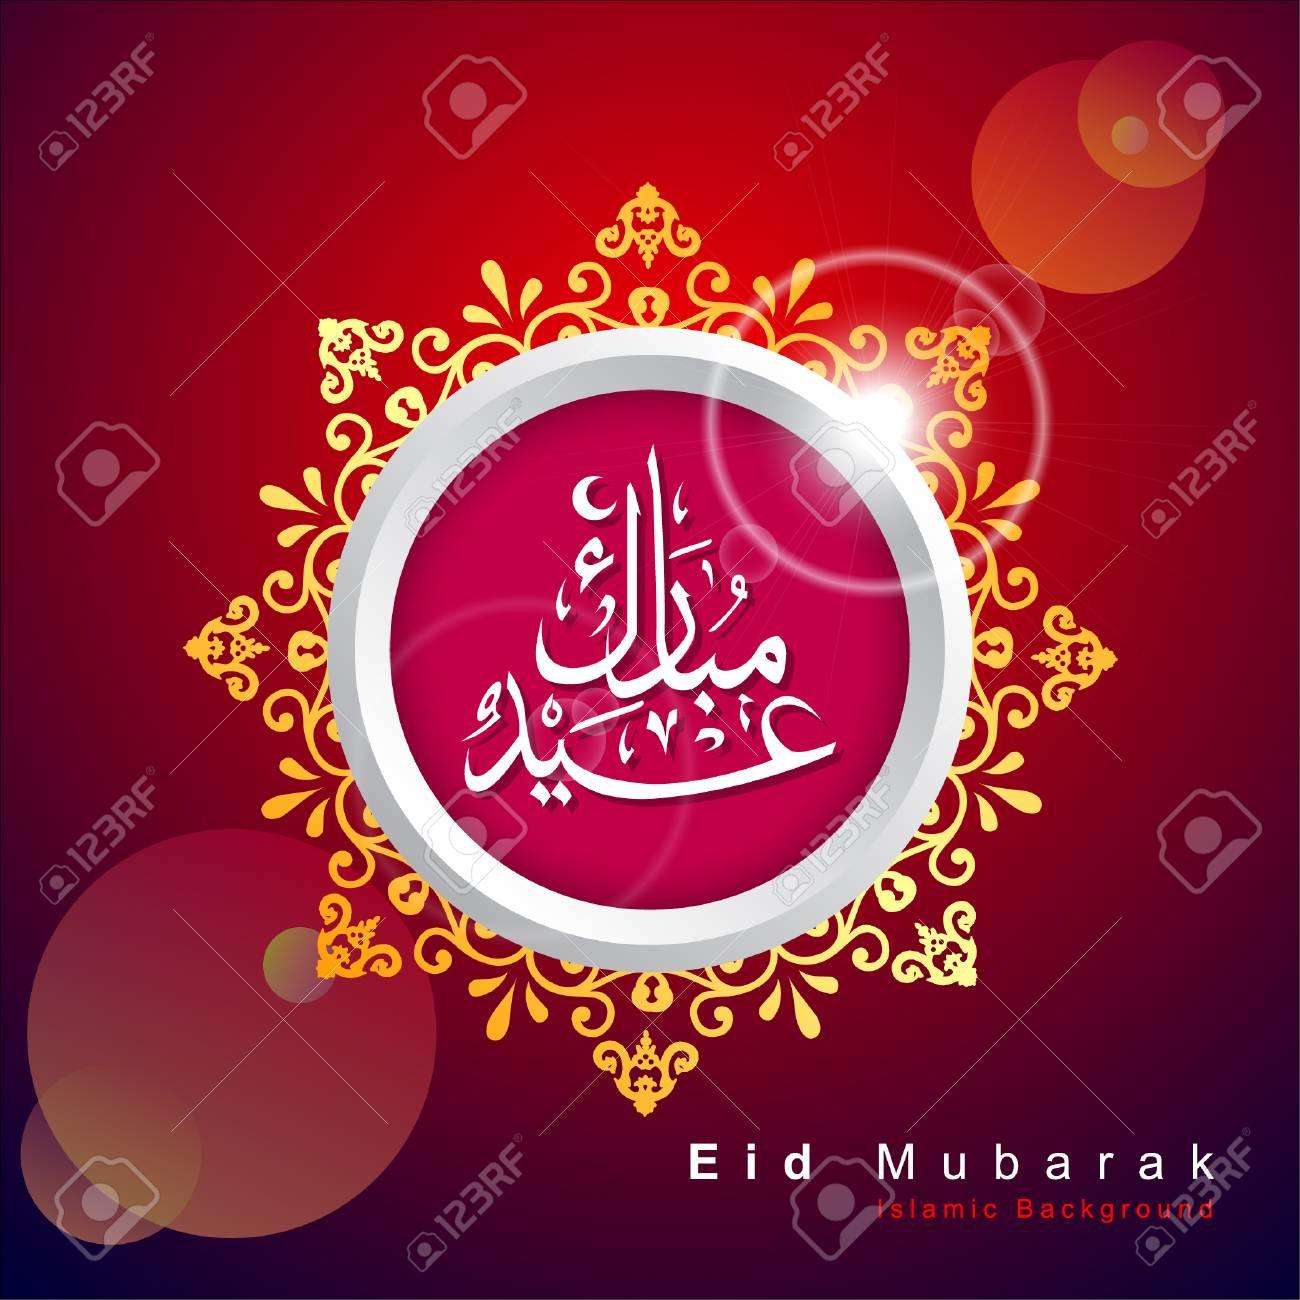 Arabic islamic calligraphy of eid mubarak background vector arabic islamic calligraphy of eid mubarak background vector and illustration eps 10 m4hsunfo